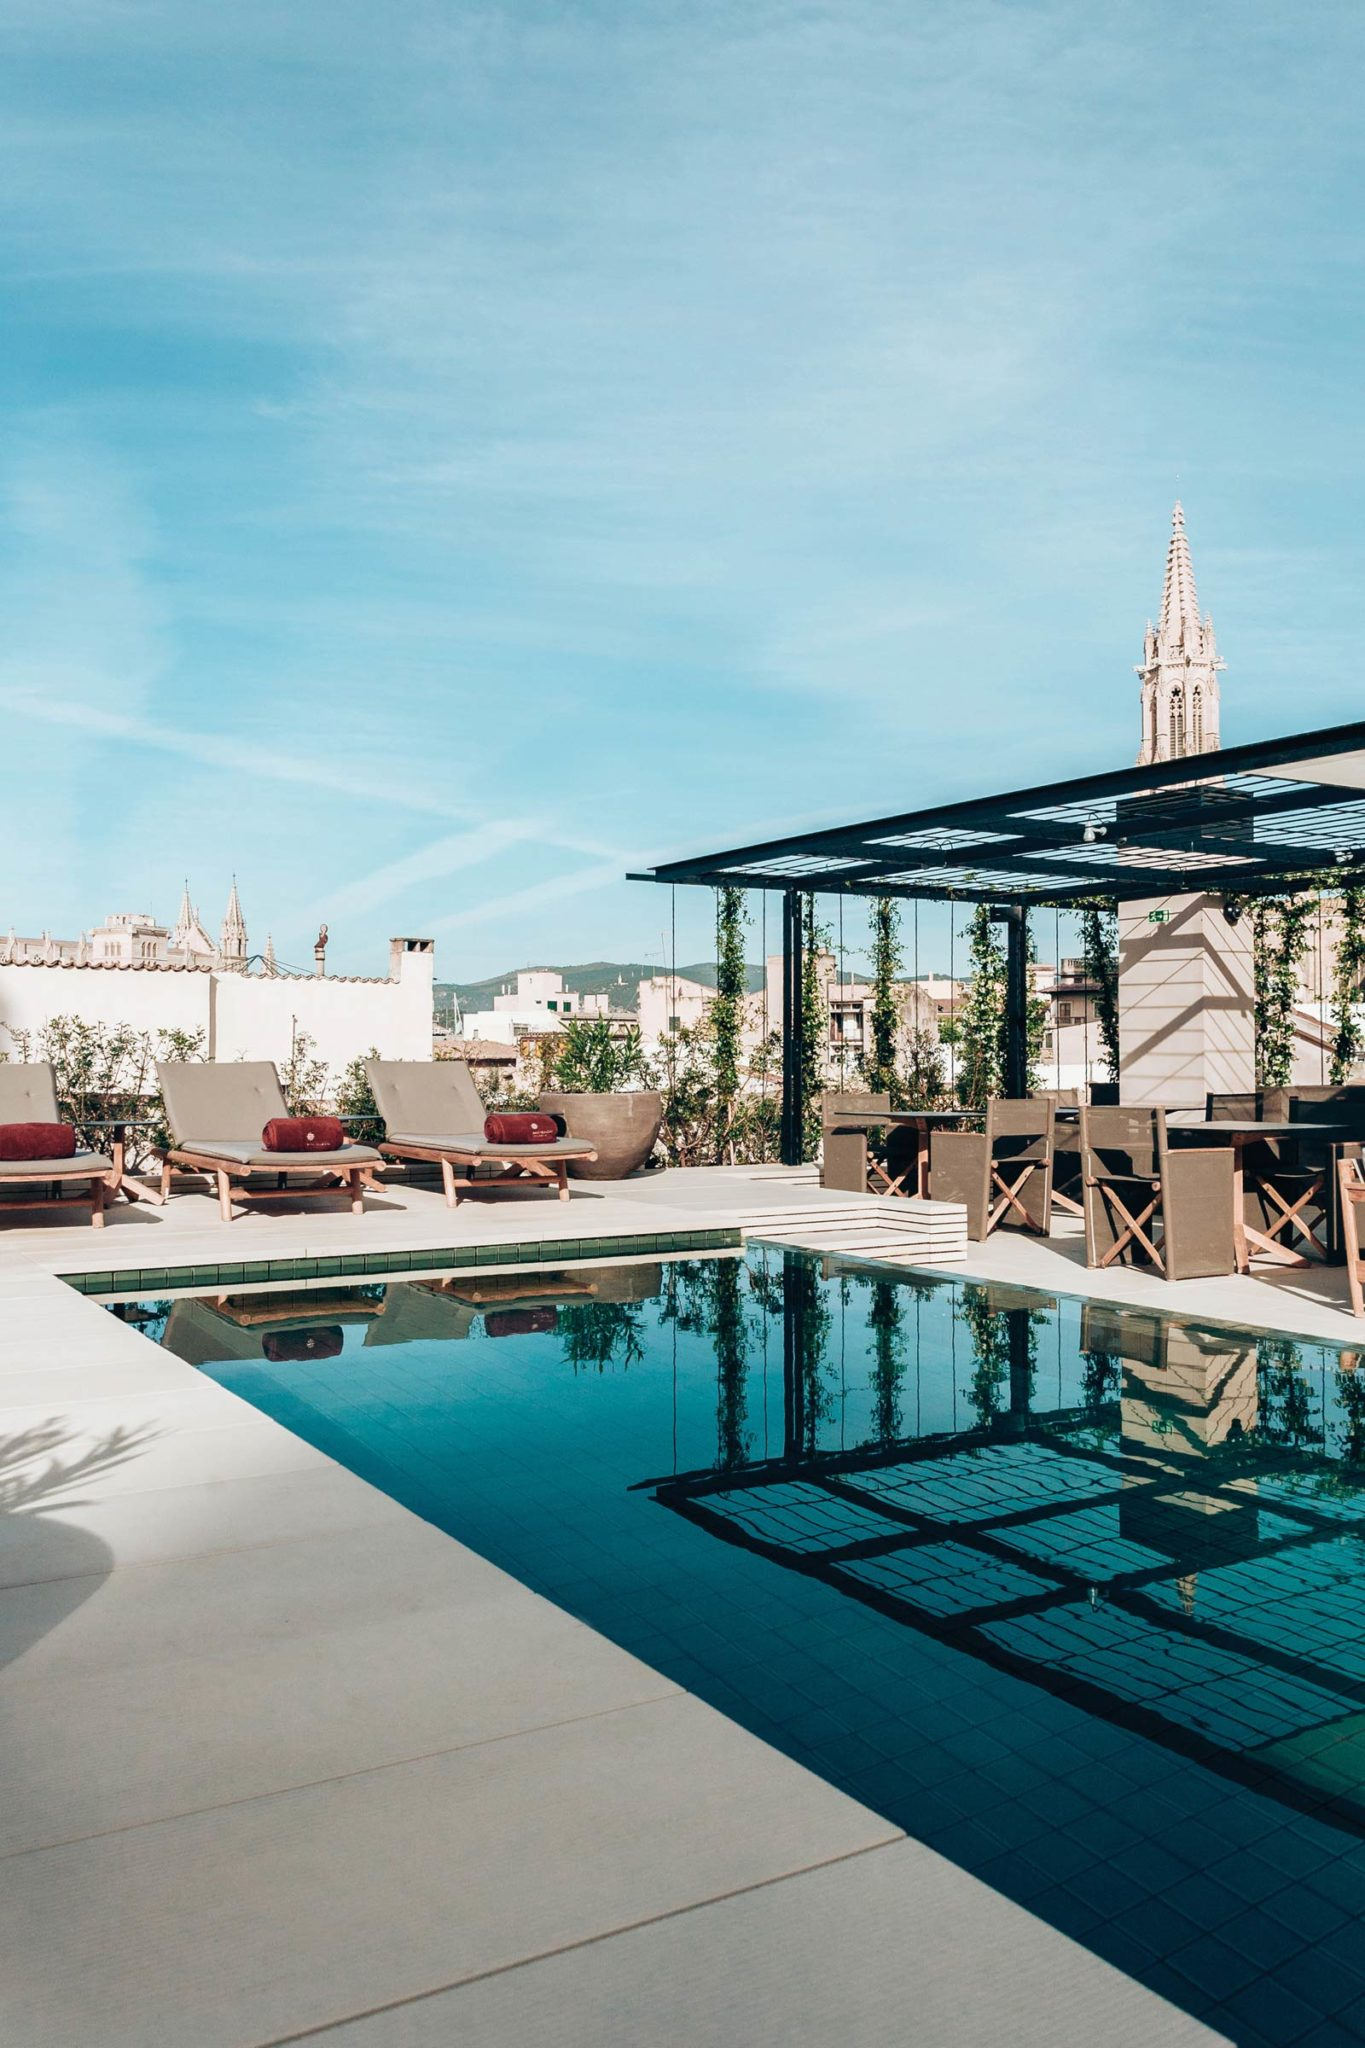 ROOFTOP-BAR/HOTEL SANT FRANCESC